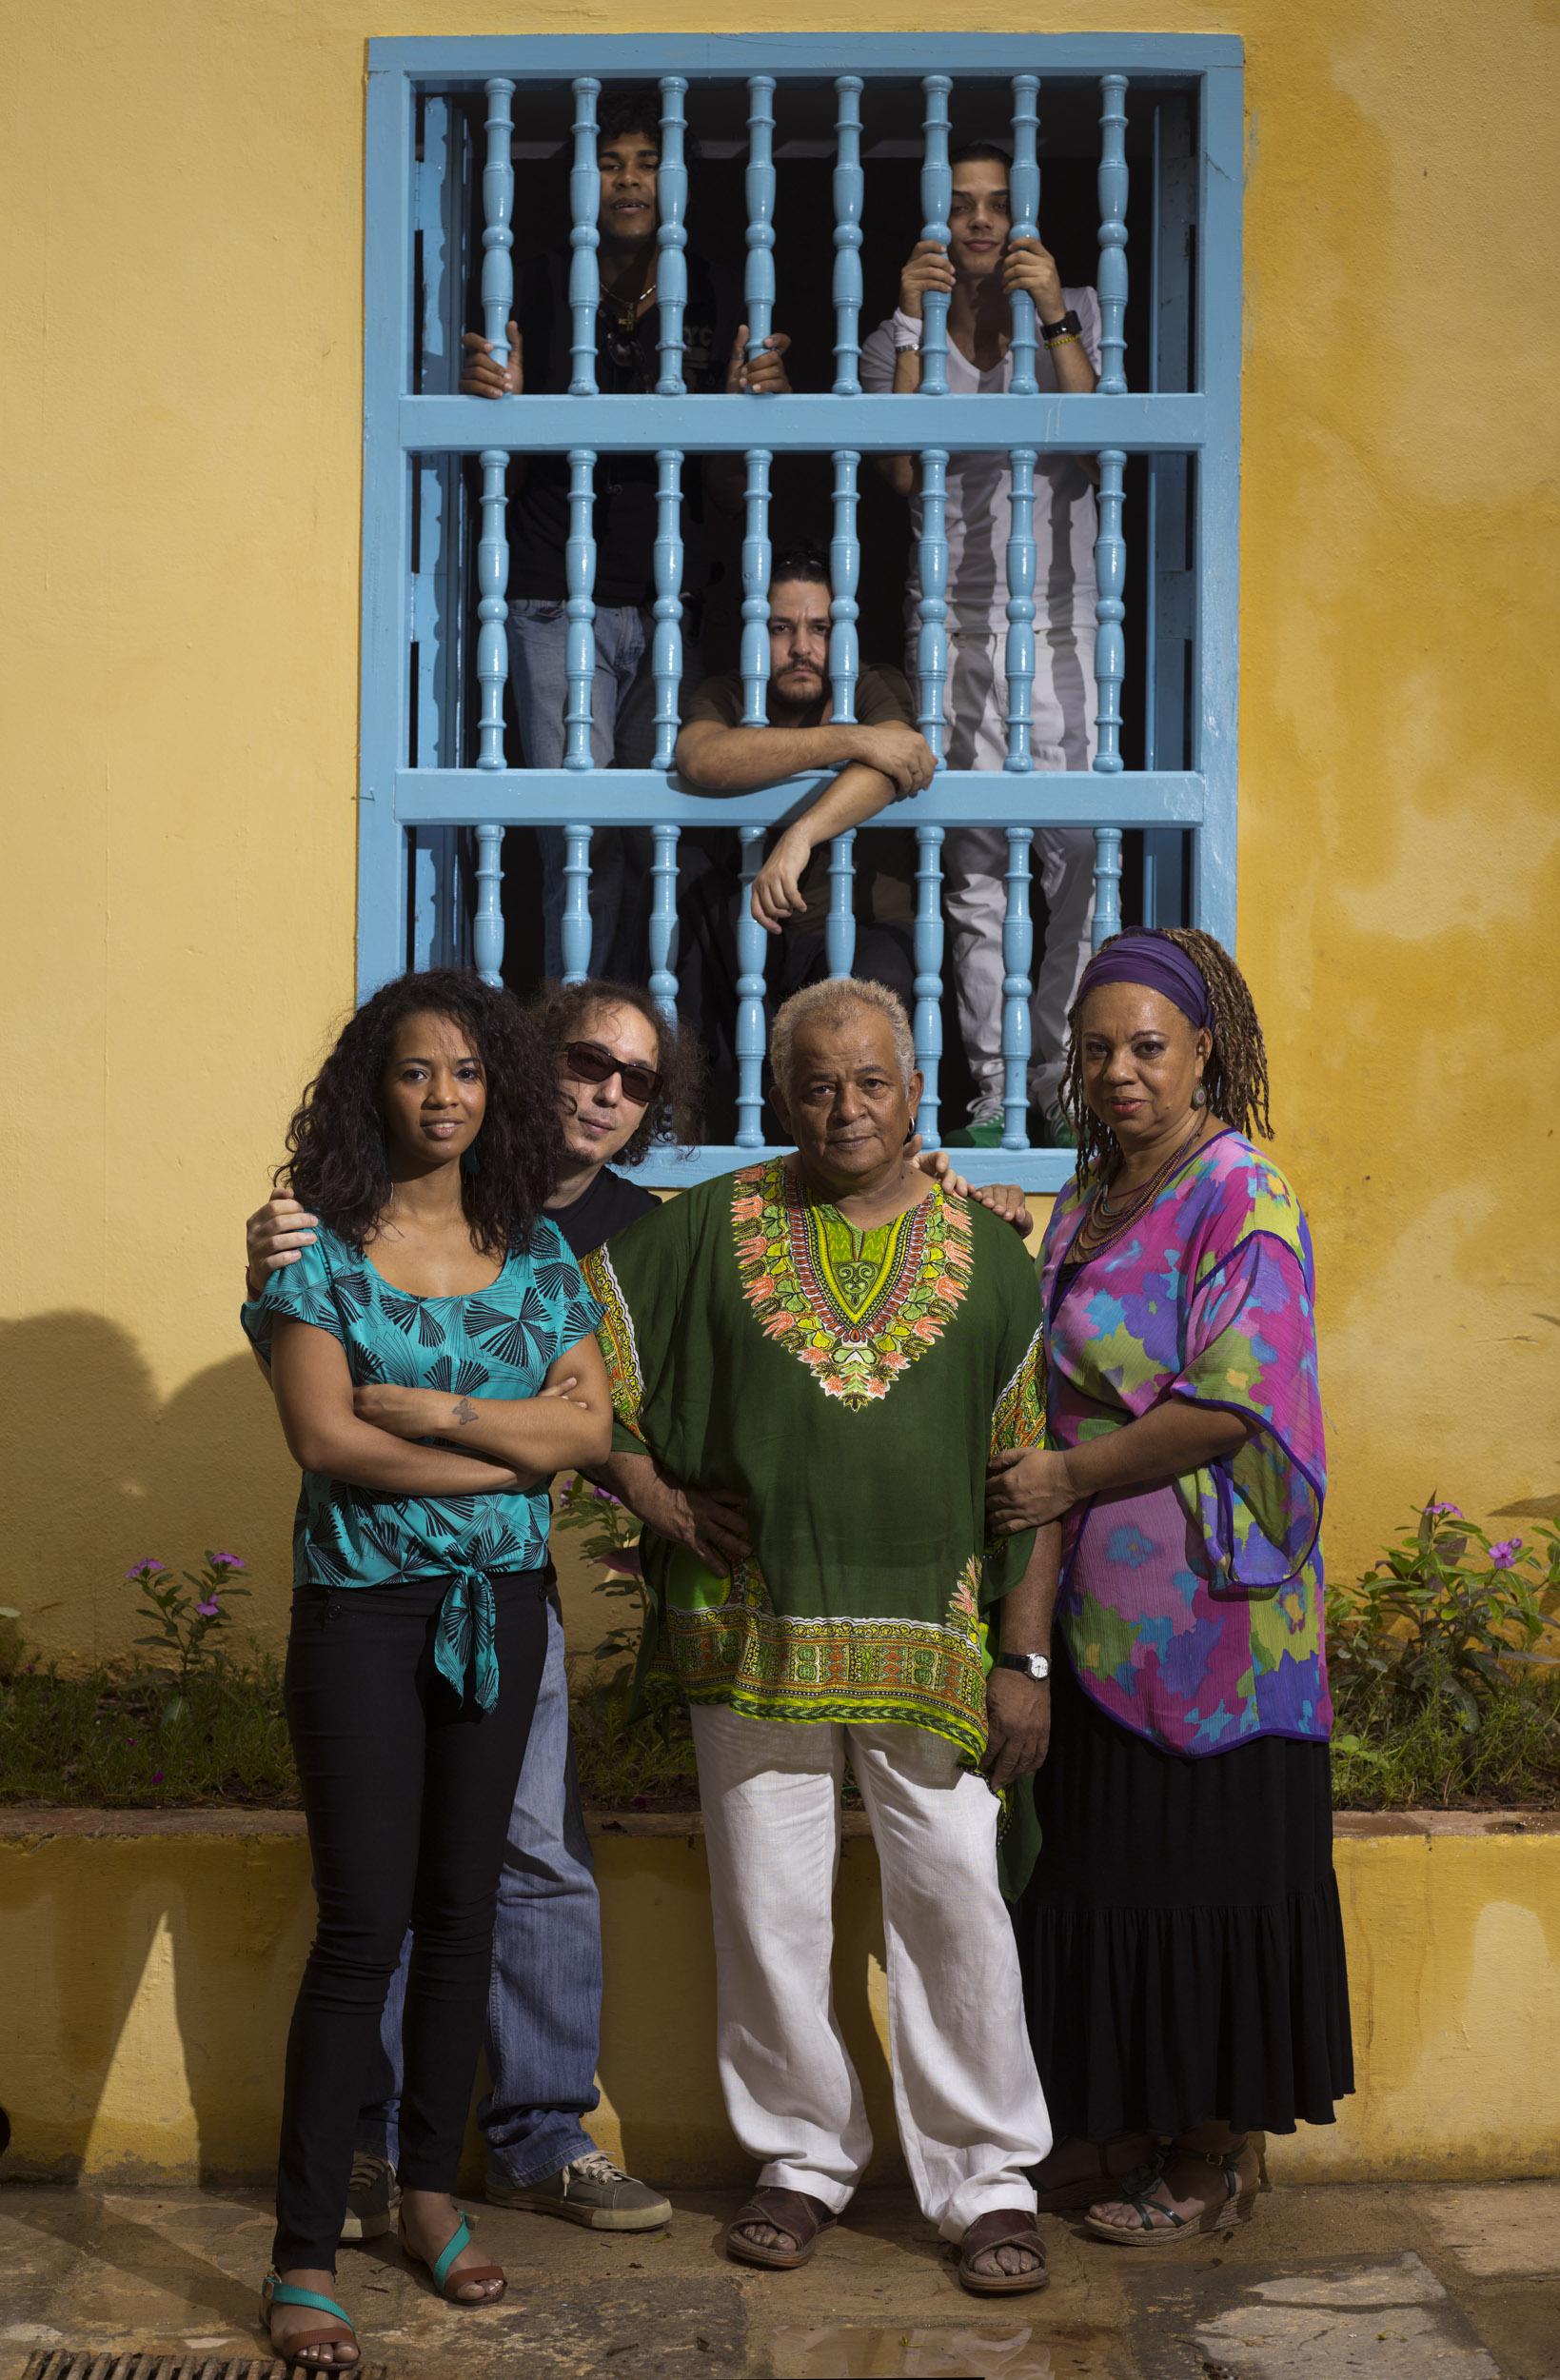 Síntesis, musicians - Illuminated Cuba - Hector Garrido, Aerial and human photography